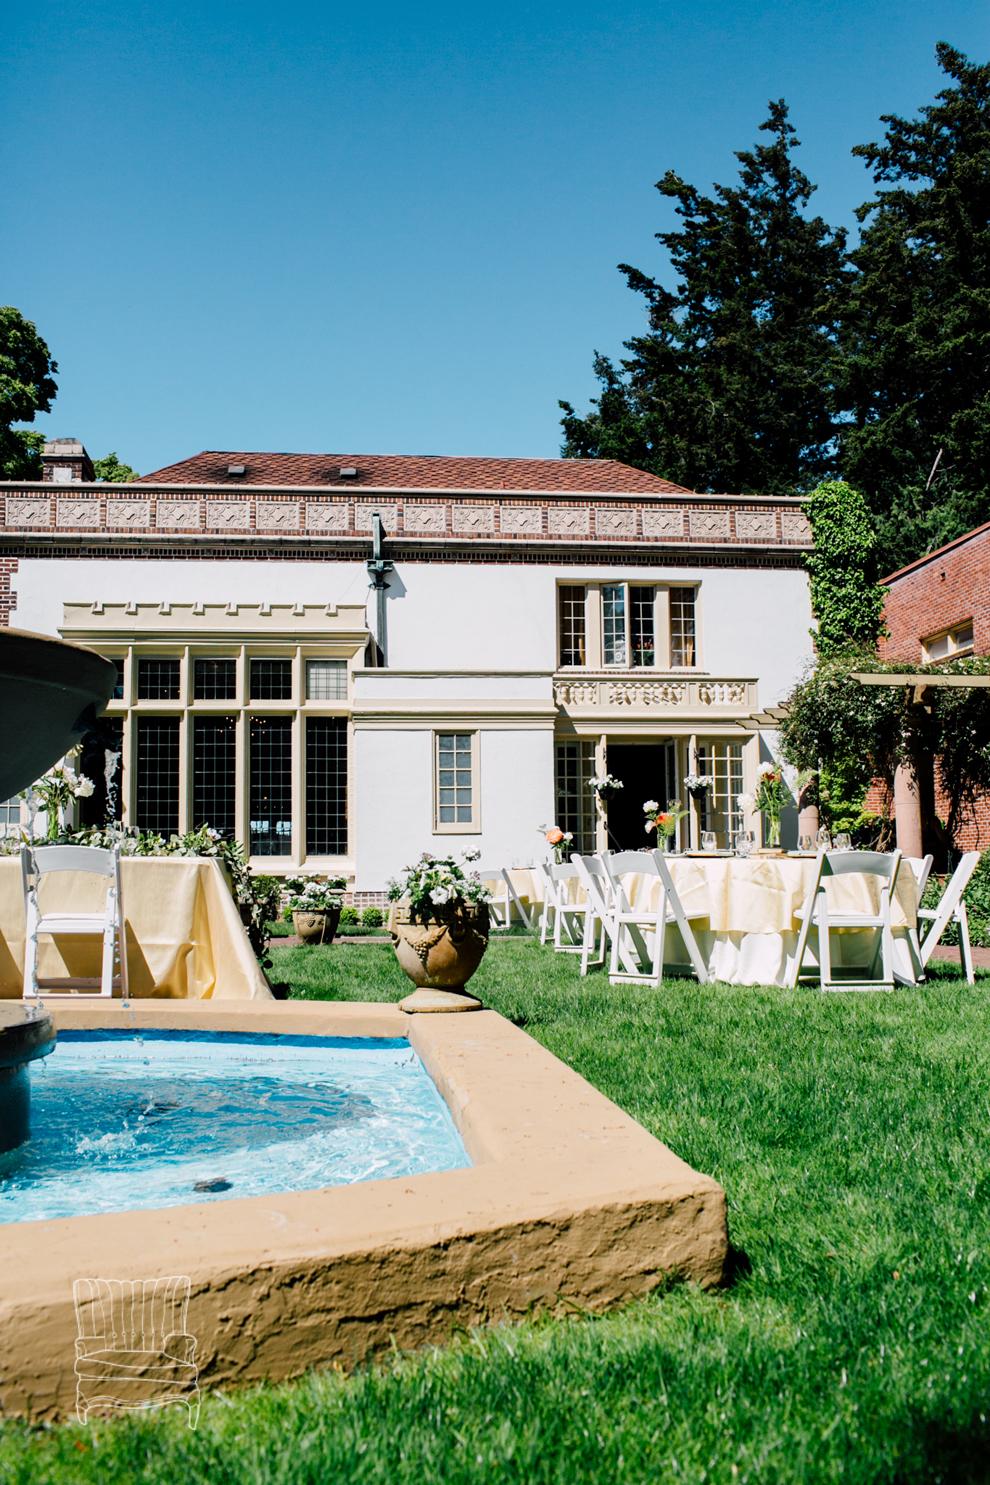 001-lairmont-manor-bellingham-washington-wedding-venue-katheryn-moran-photography-marketing.jpg